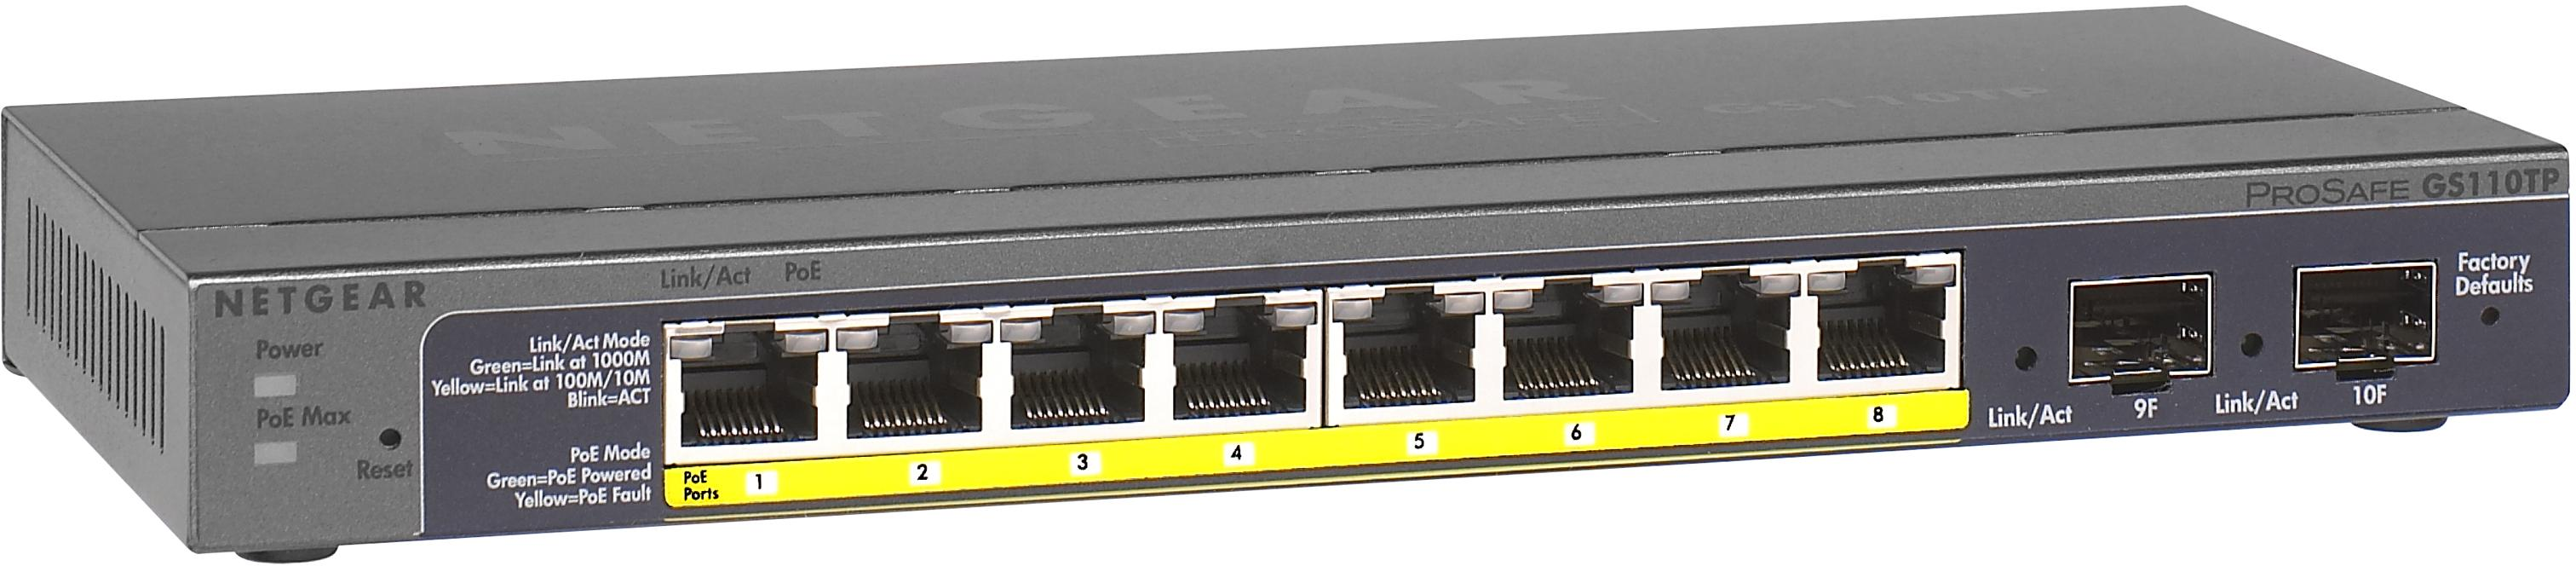 Akotuvas Netgear Prosafe Smart 10 Port Gigabit Switch 8xpoe 2xsfp Gs110tp V2